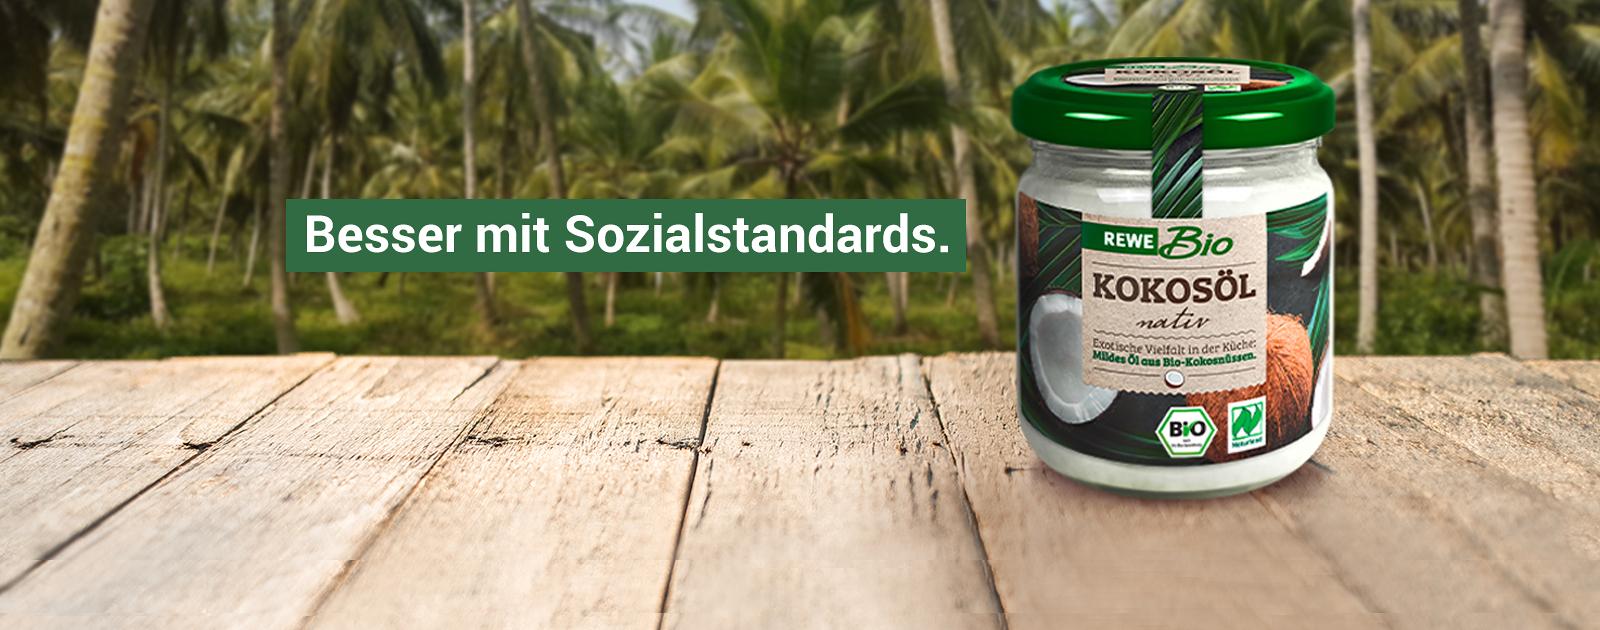 Sozialstandards REWE Bio Naturland Produkte